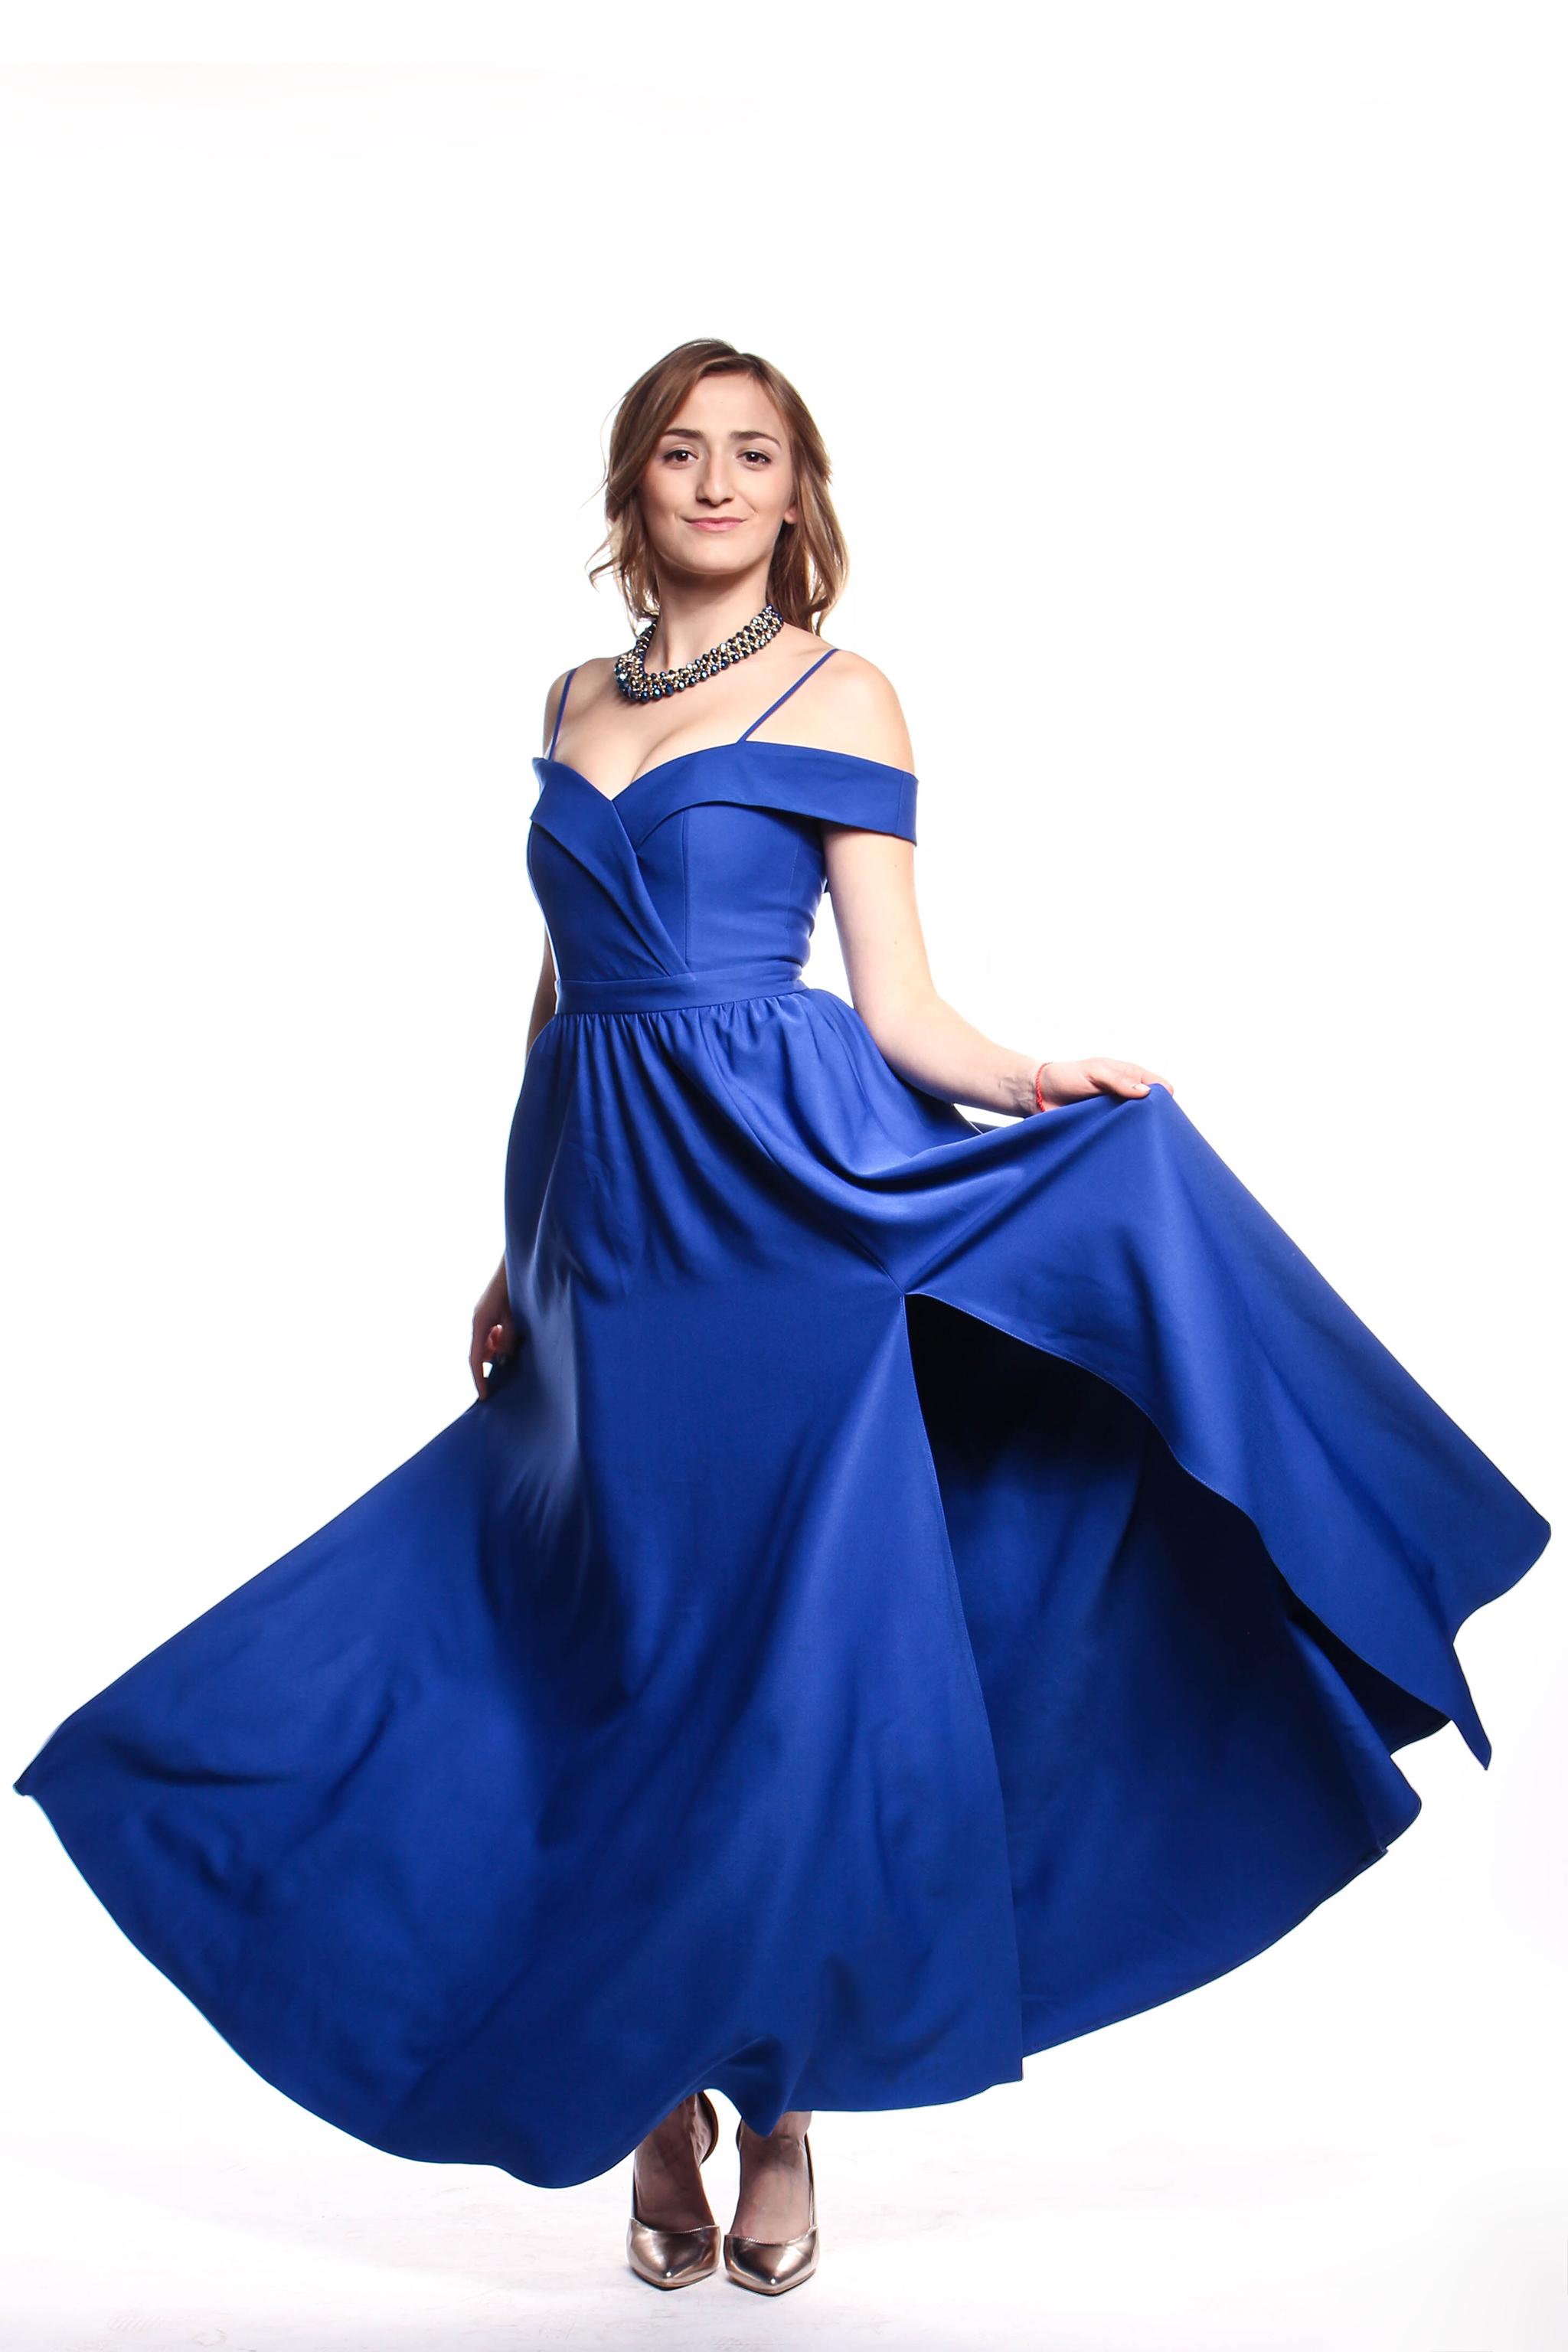 Obrázok 3 Modré plesové šaty - Shaty 636c6a6f2a4